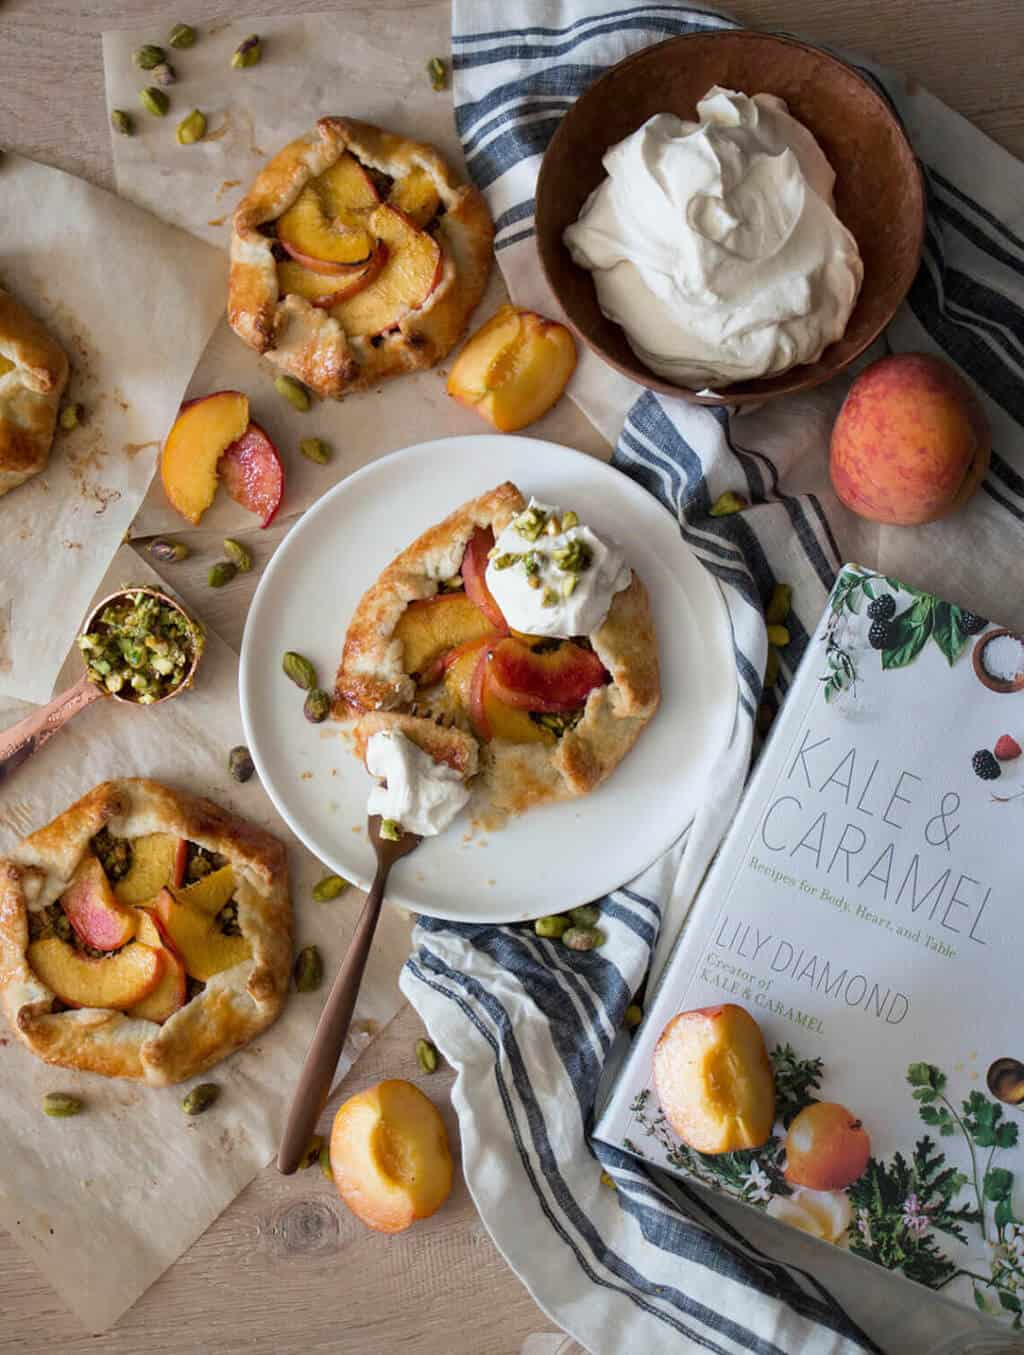 Peach & Pistachio Galette